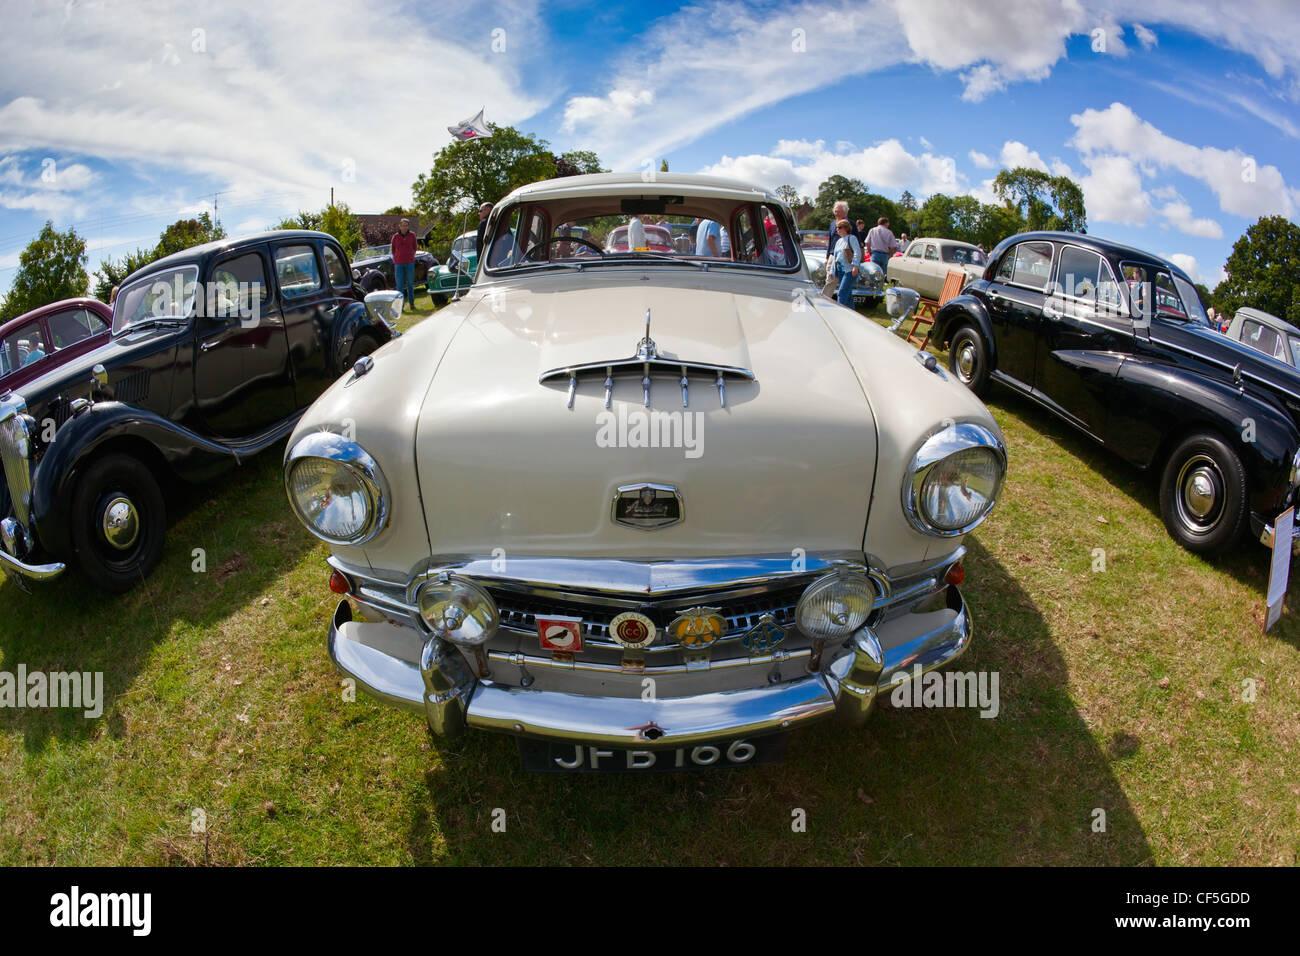 Cofano di una Austin 7 sul display a Thornfalcon Classic Car Meeting.